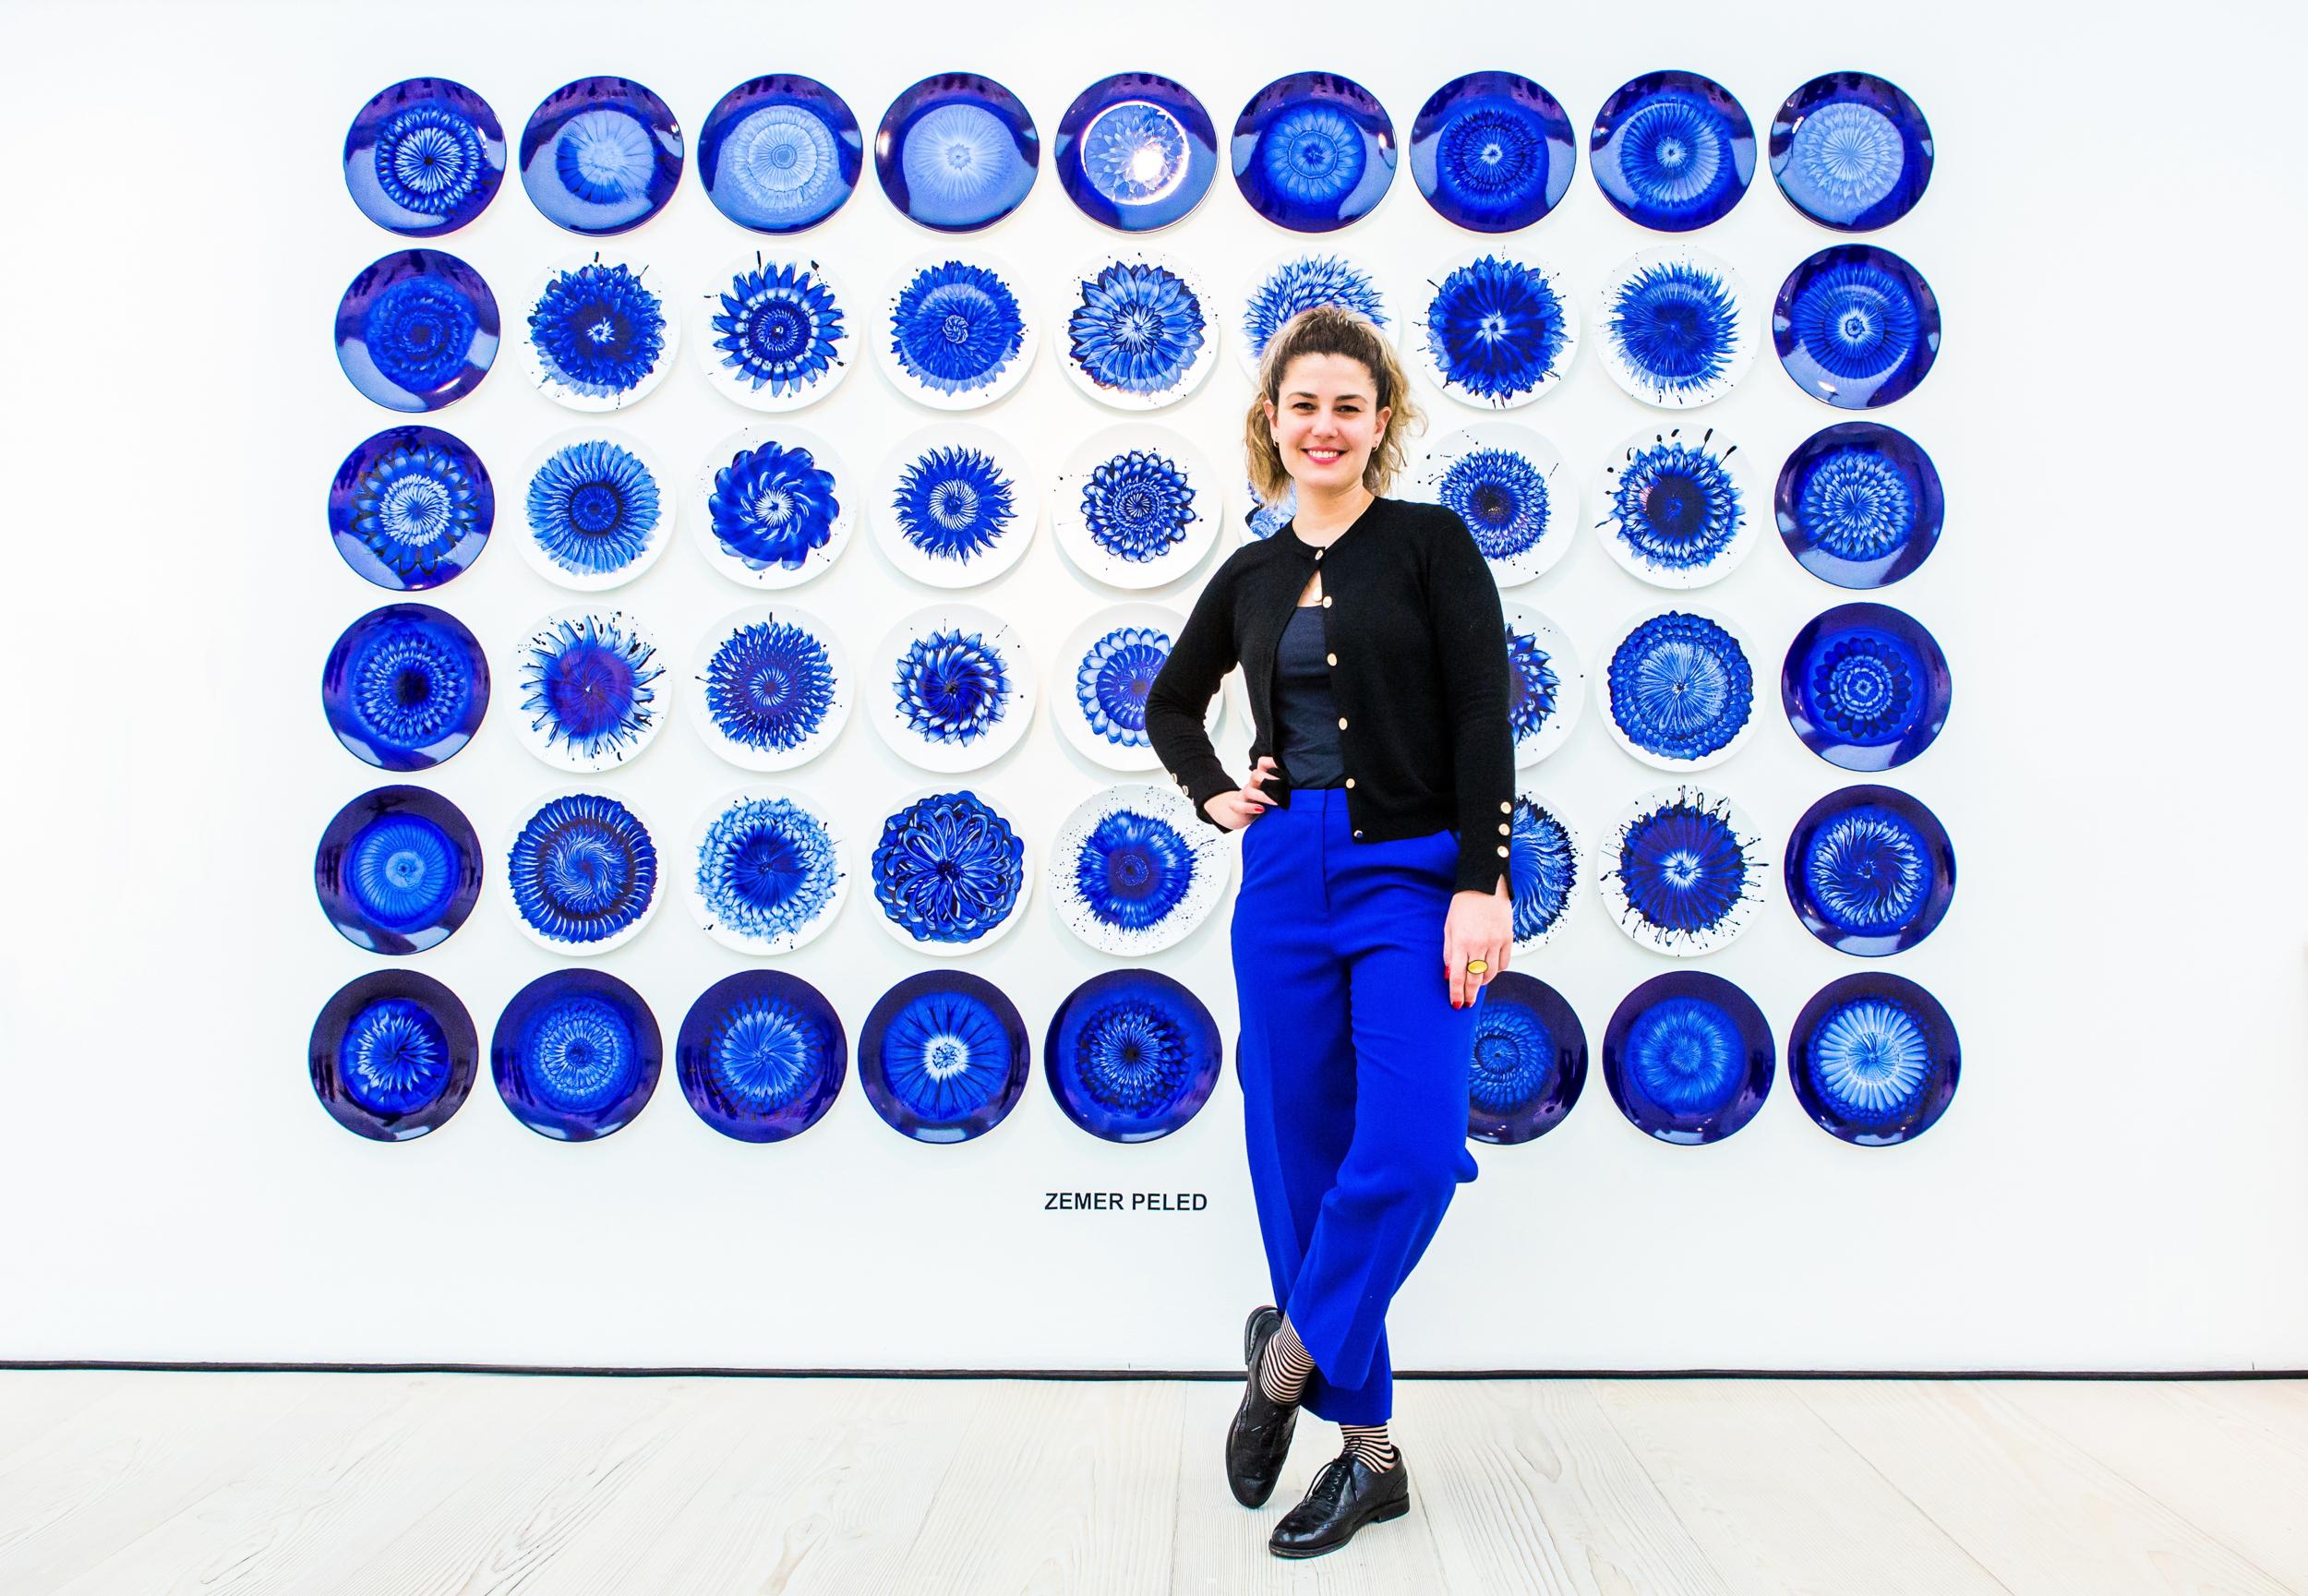 Zemer Peled at Collect 2019, Cynthia Corbett Gallery, photo credit Cristina Schek (2).jpg